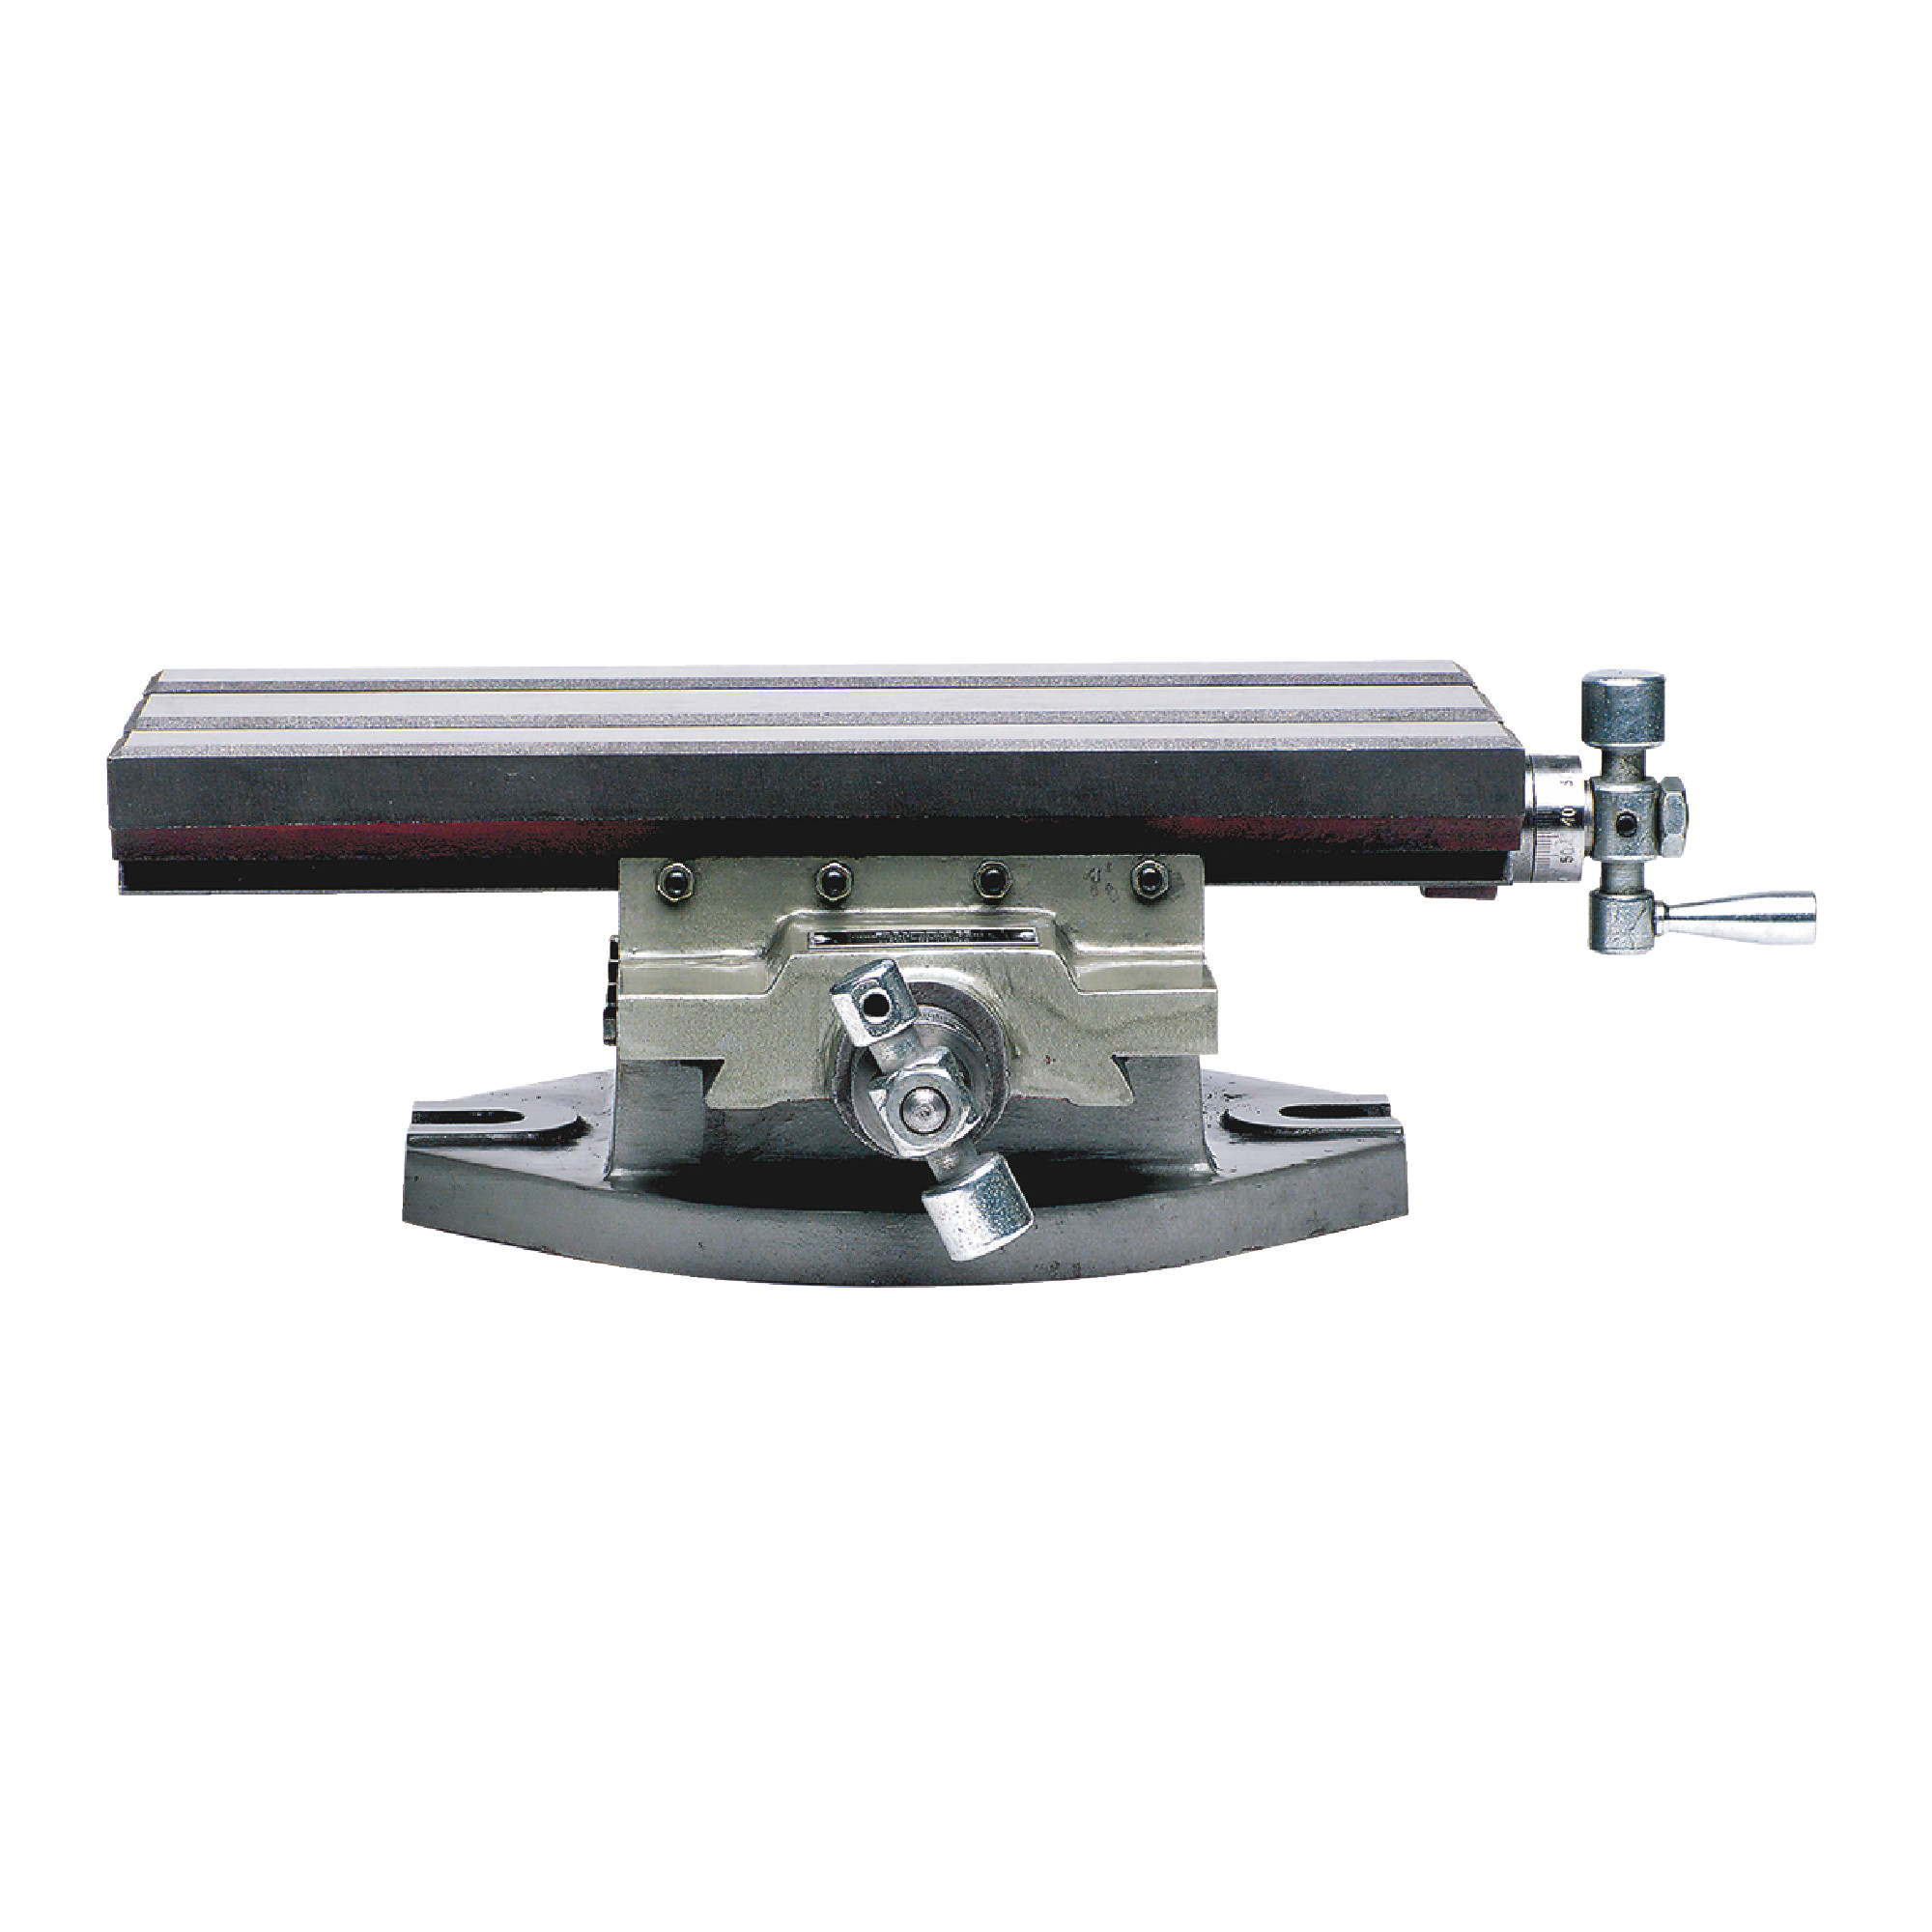 Compound Milling & Drilling Slide Table